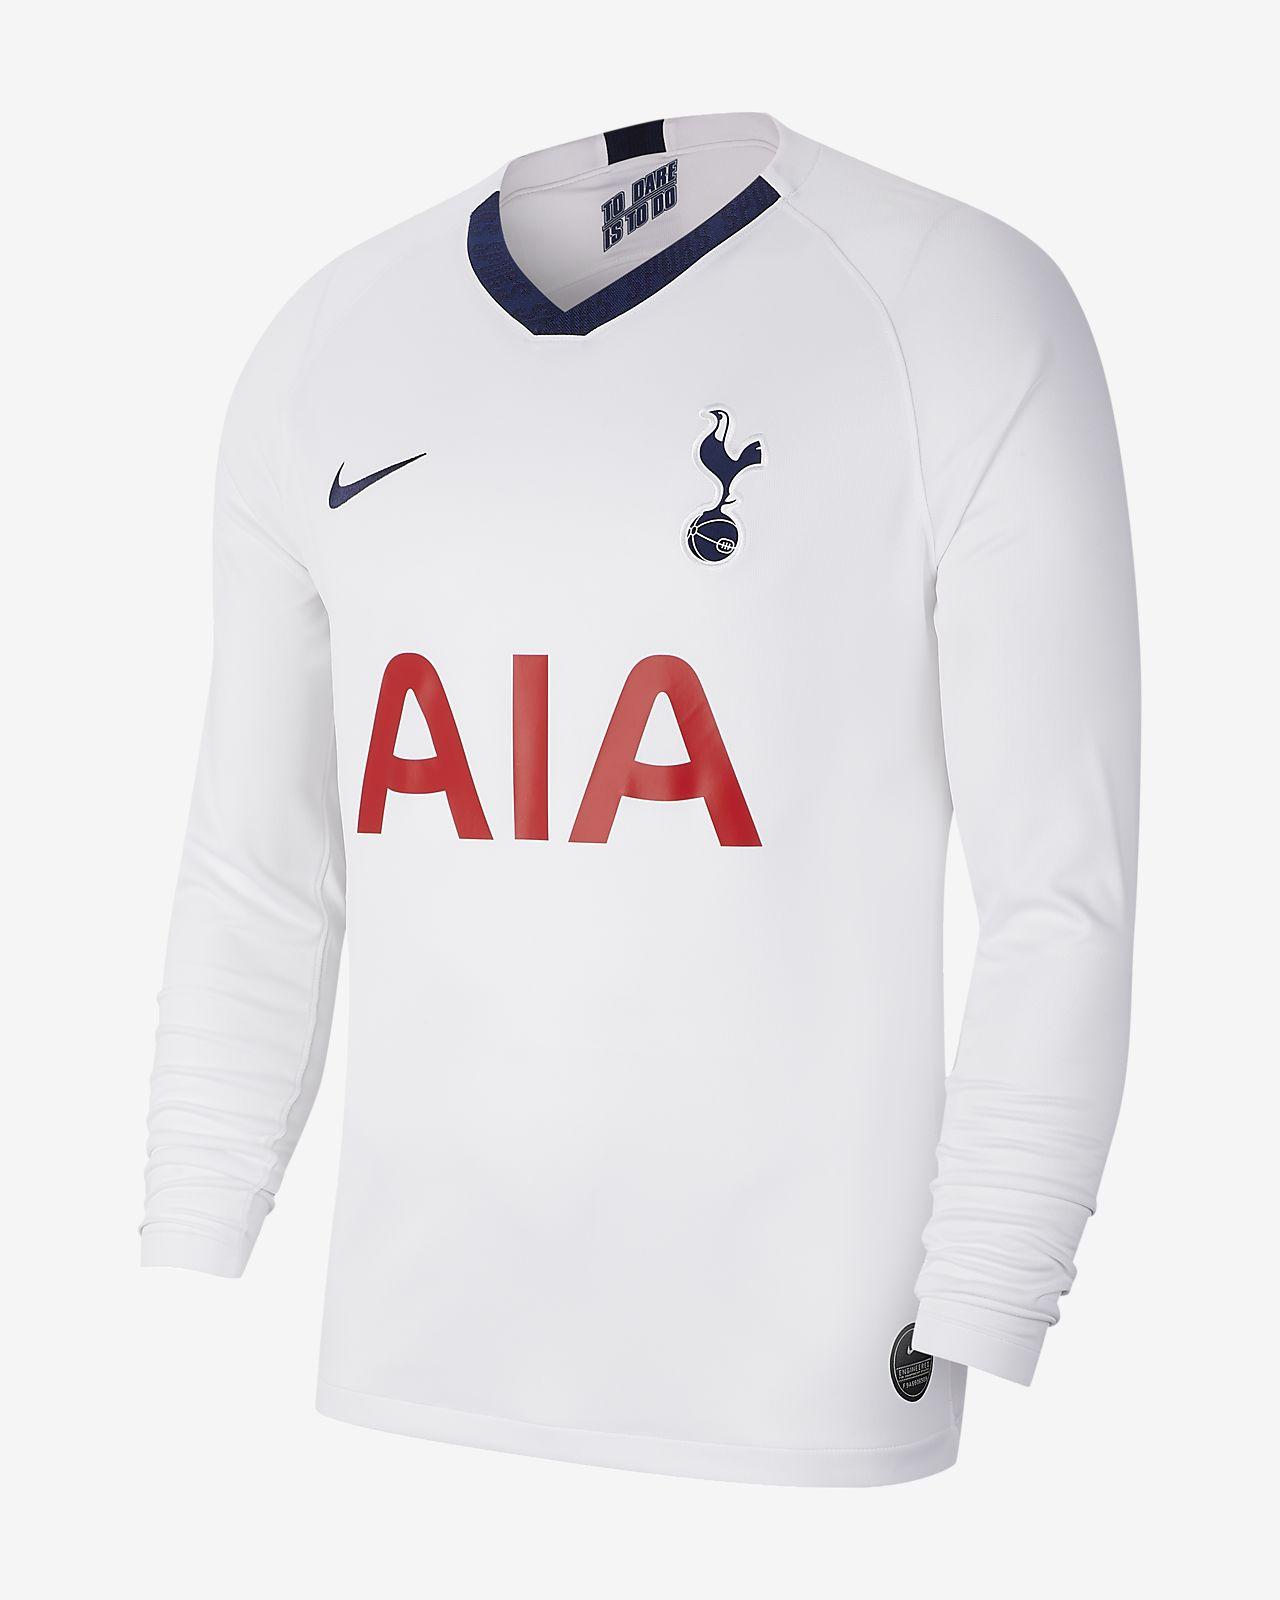 Tottenham Hotspur 2019/20 Stadium Home Men's Long-Sleeve Football Shirt